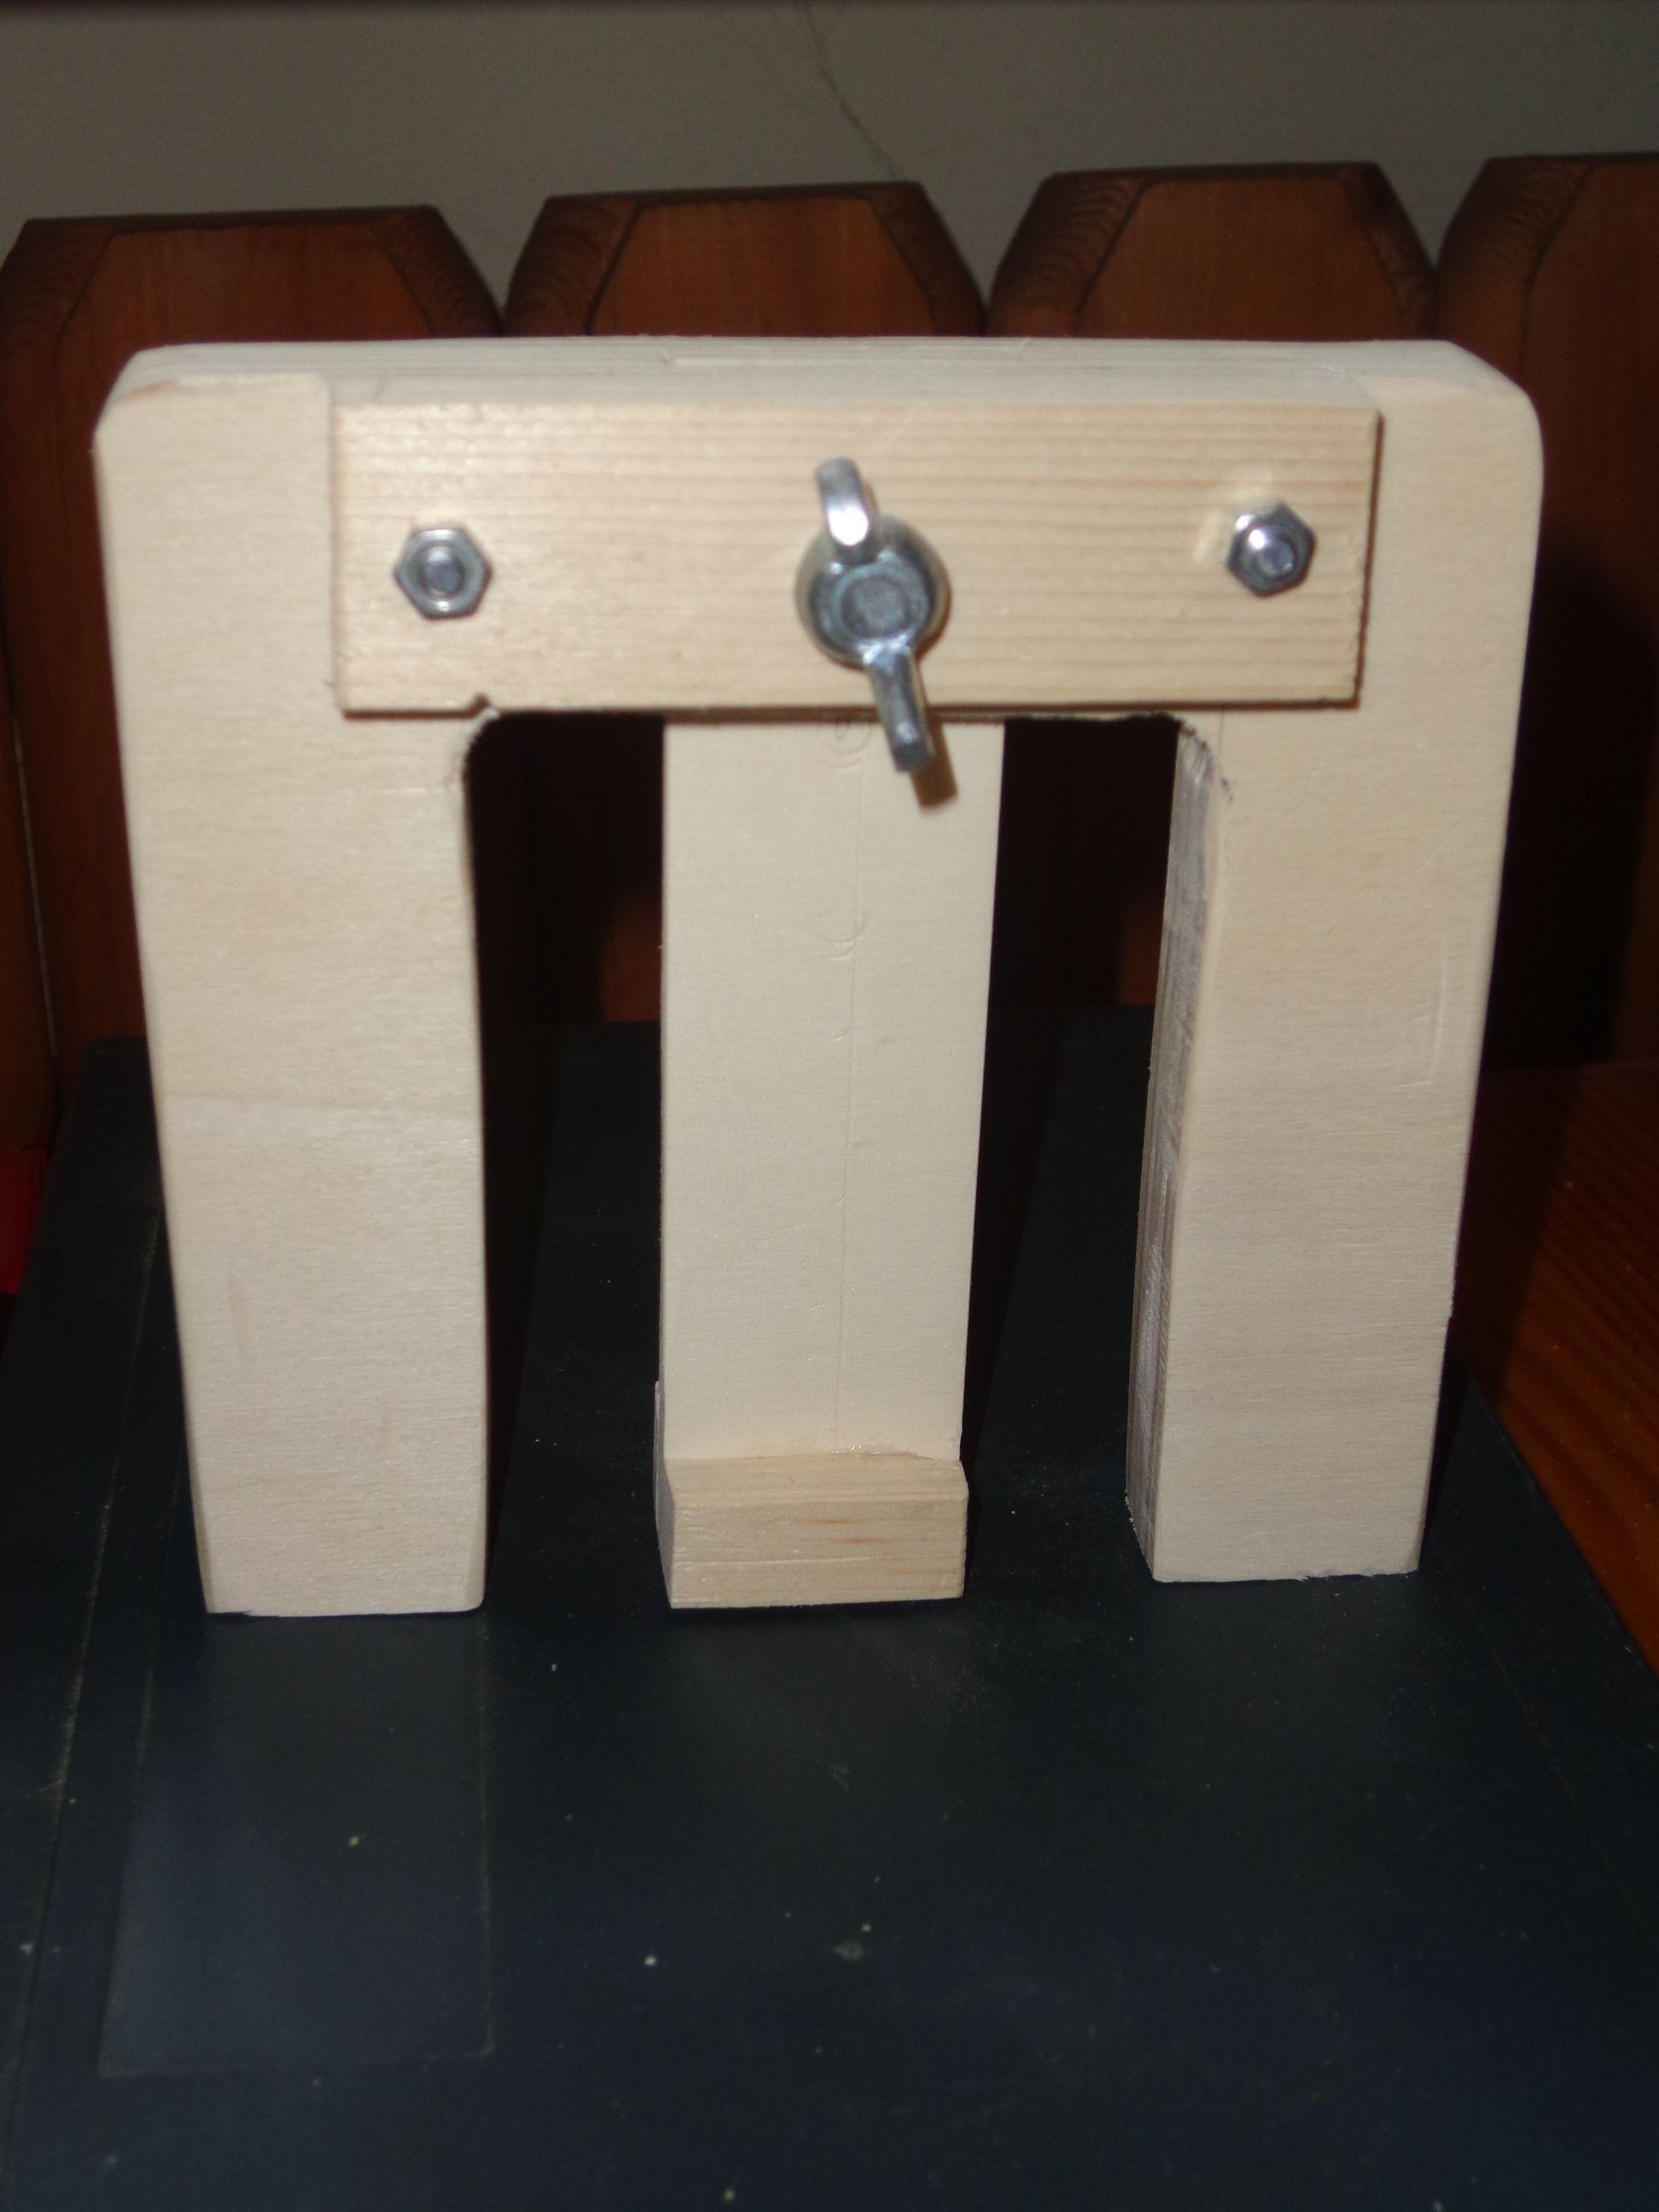 einstellhilfe f r oberfr se fr stisch tischkreiss ge pr ce se d evem pinterest. Black Bedroom Furniture Sets. Home Design Ideas